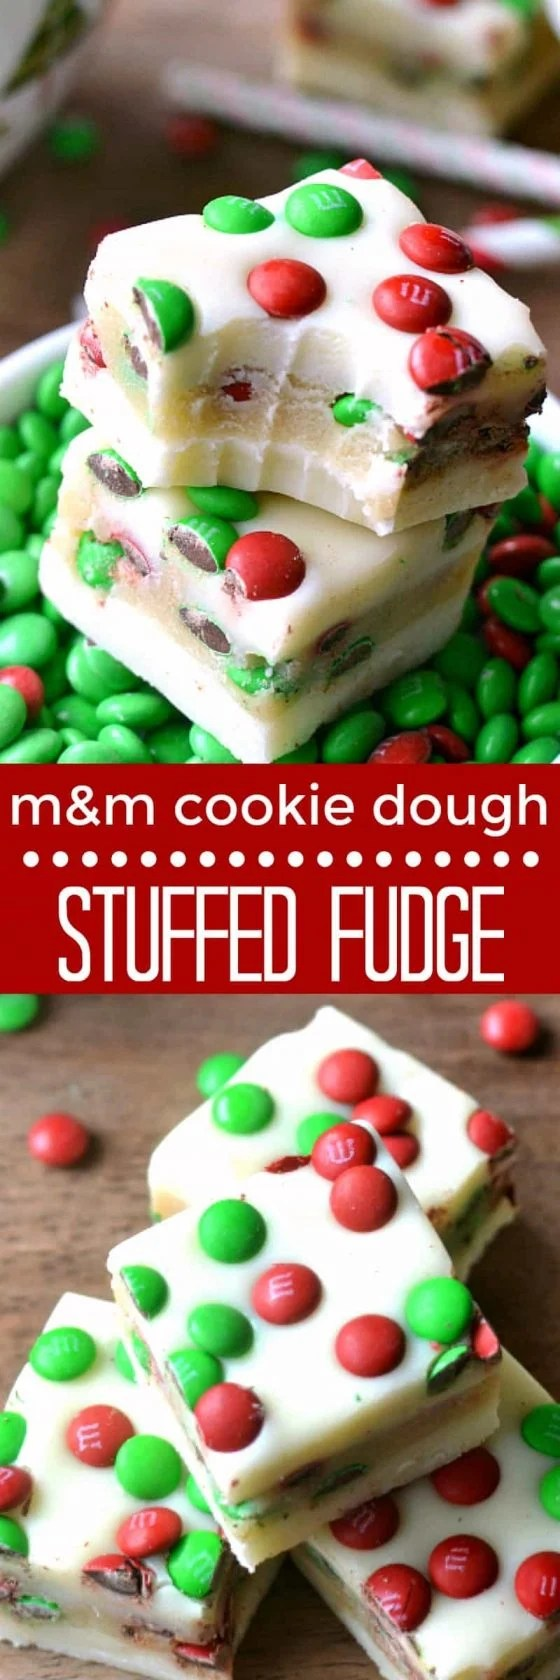 M&M Cookie Dough Stuffed Fudge - The BEST Holiday Fudge Recipes!